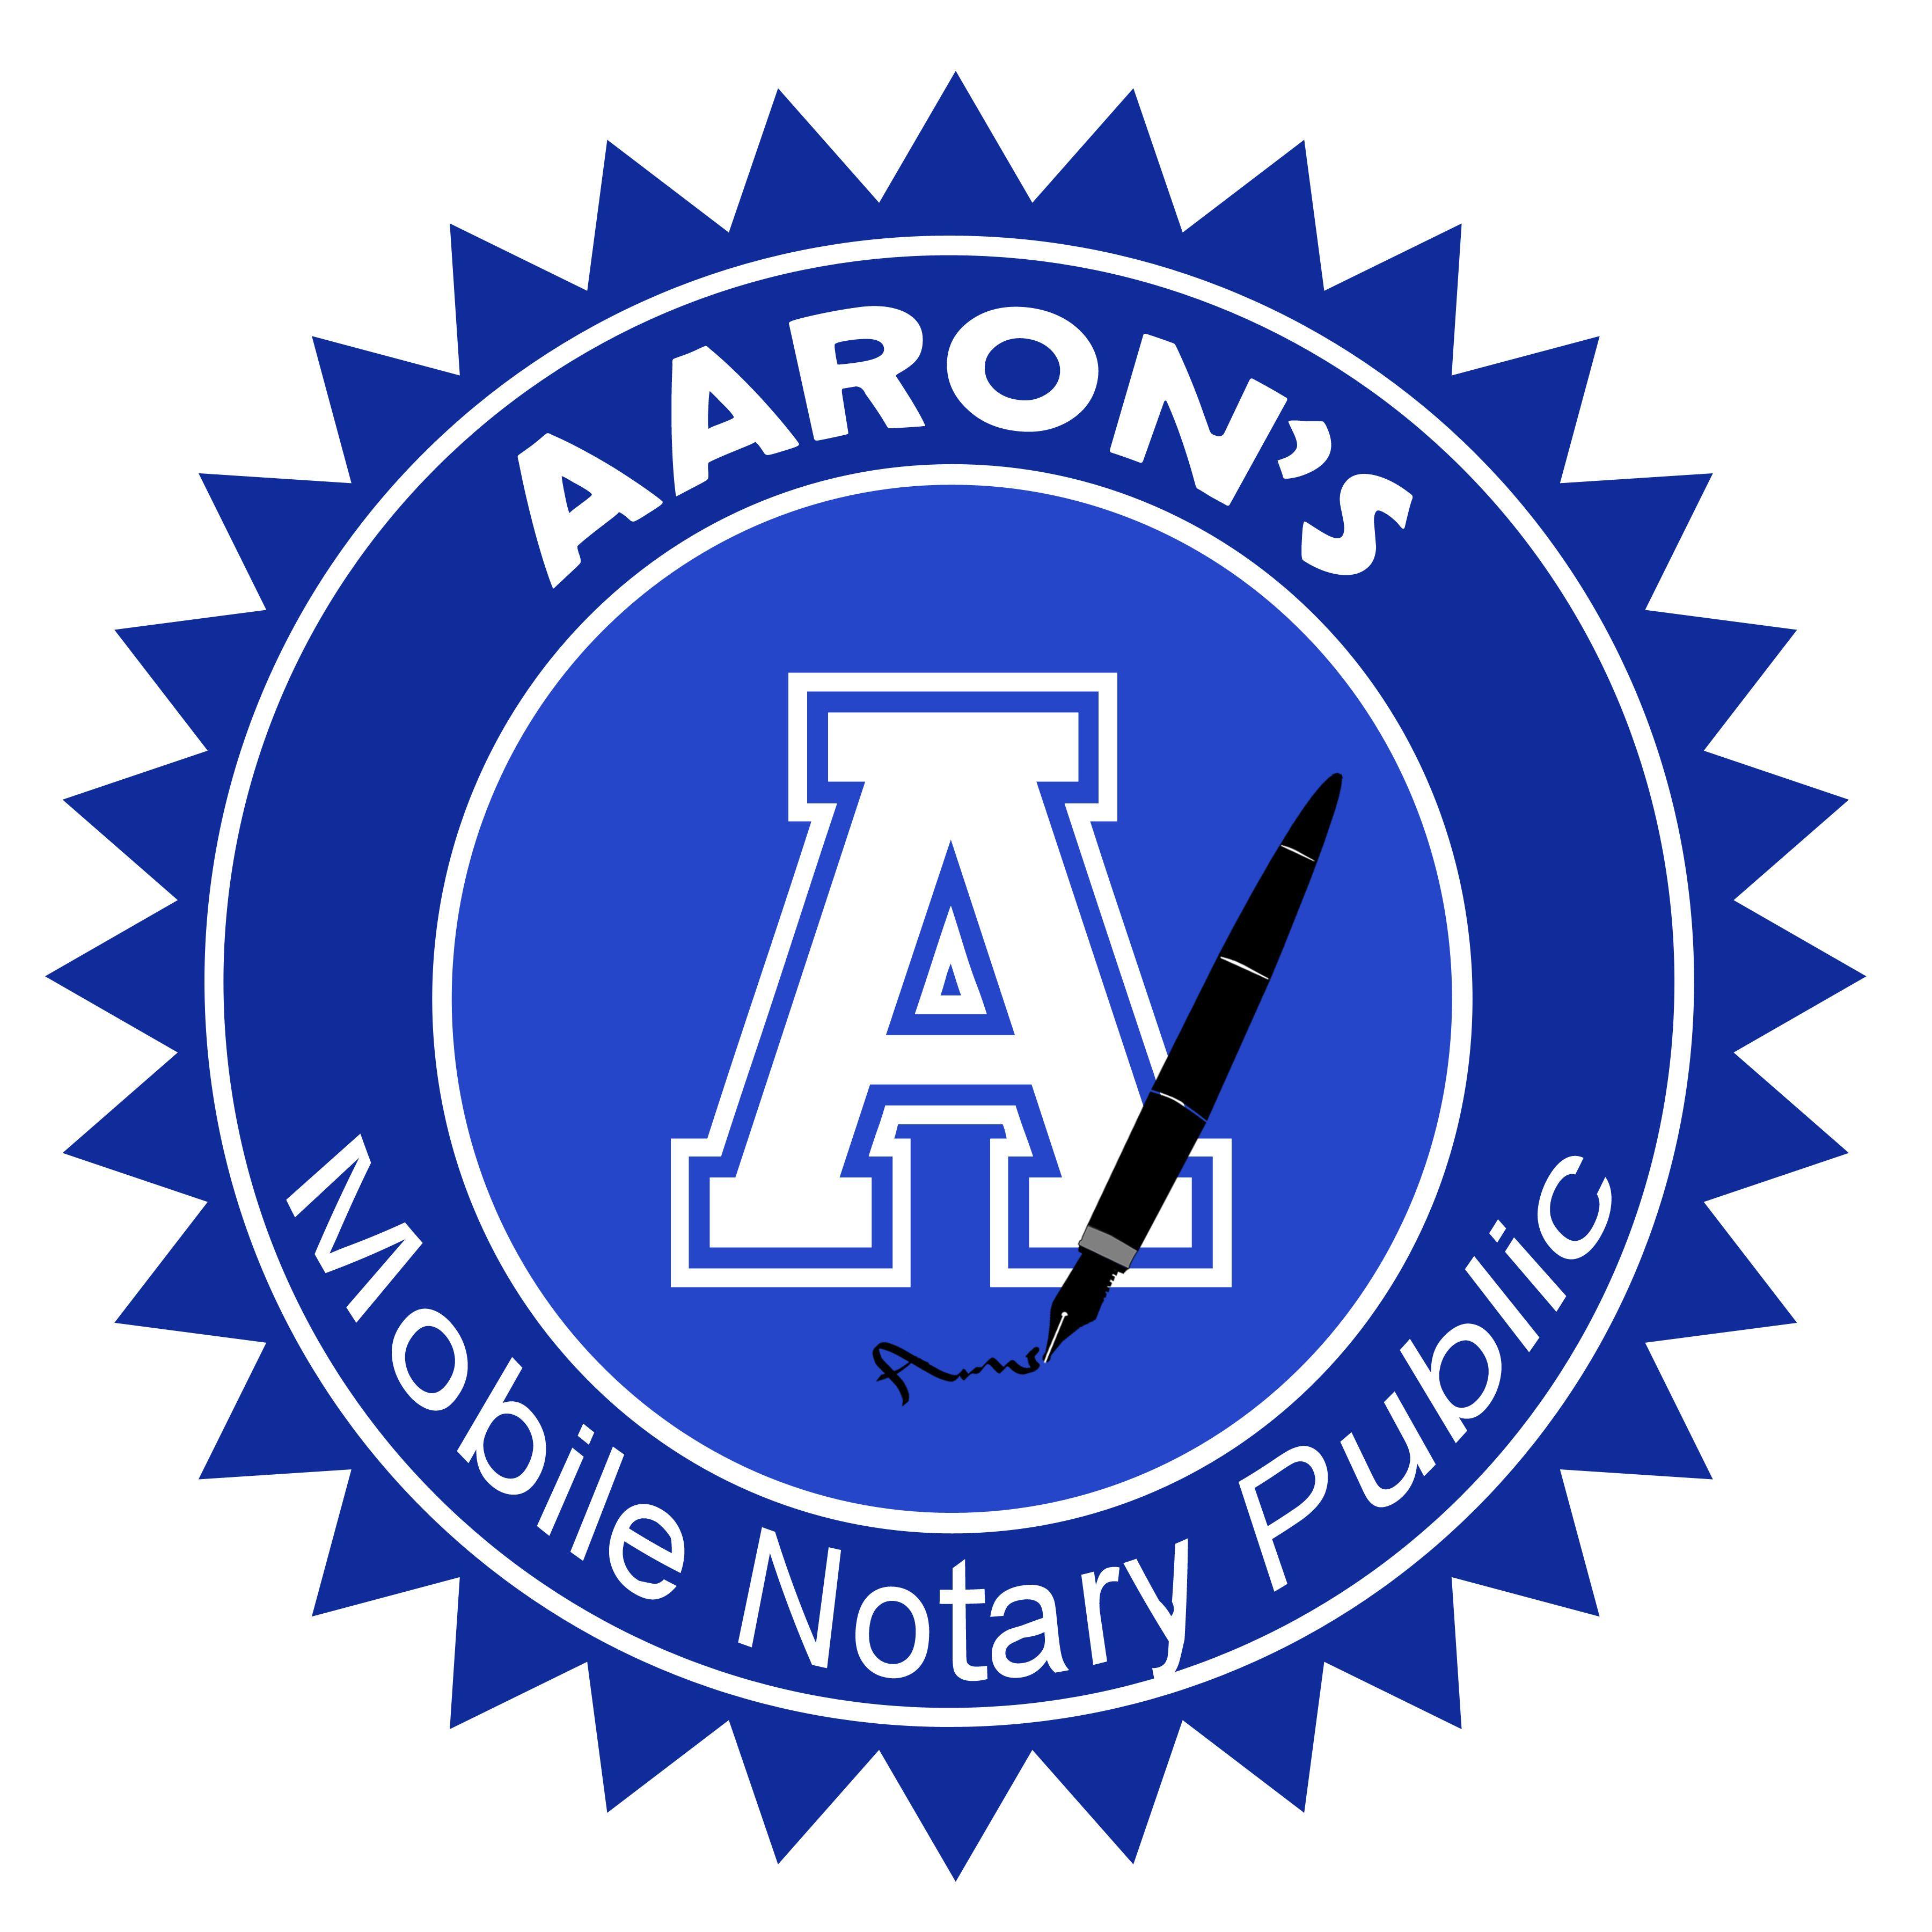 mobile notary public logo design by ednamdesigns com logos and rh pinterest com notary public loganville ga notary public logansport in